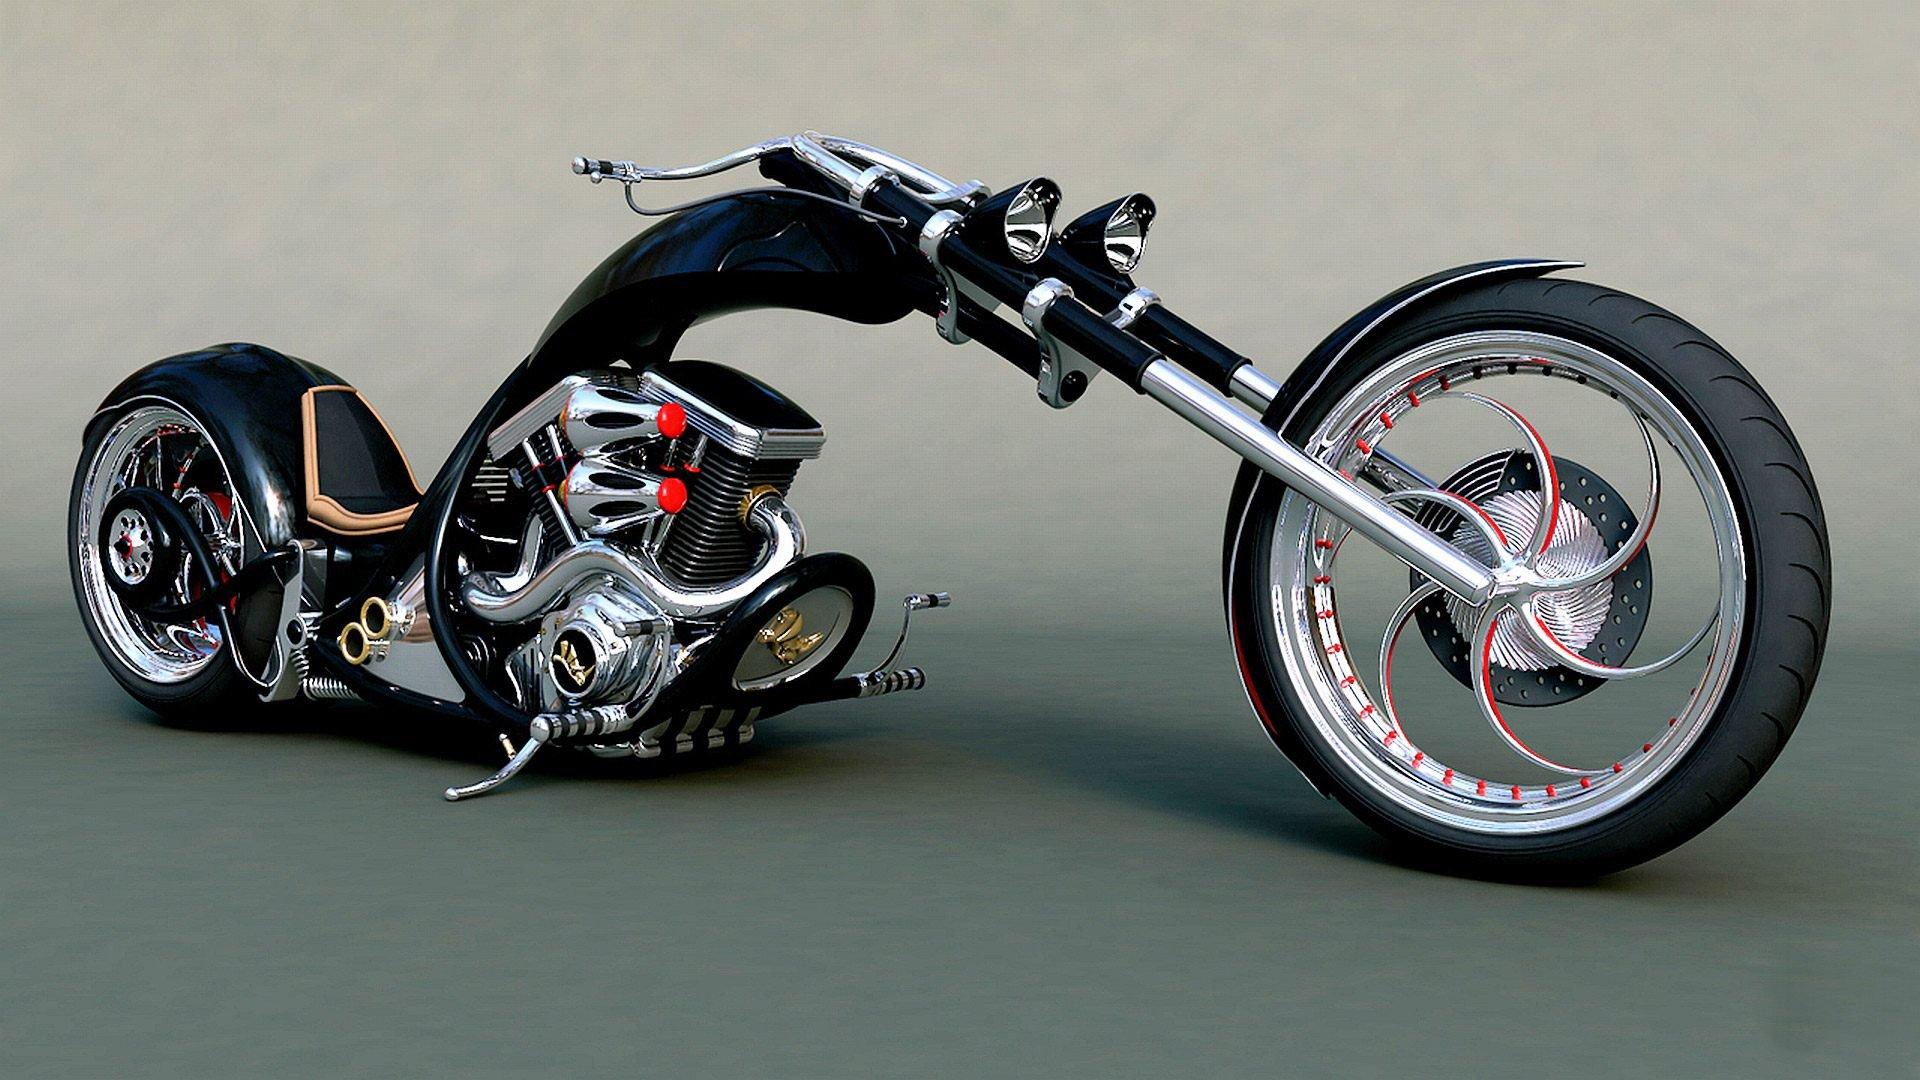 chopper motorcycles wallpaper - photo #37